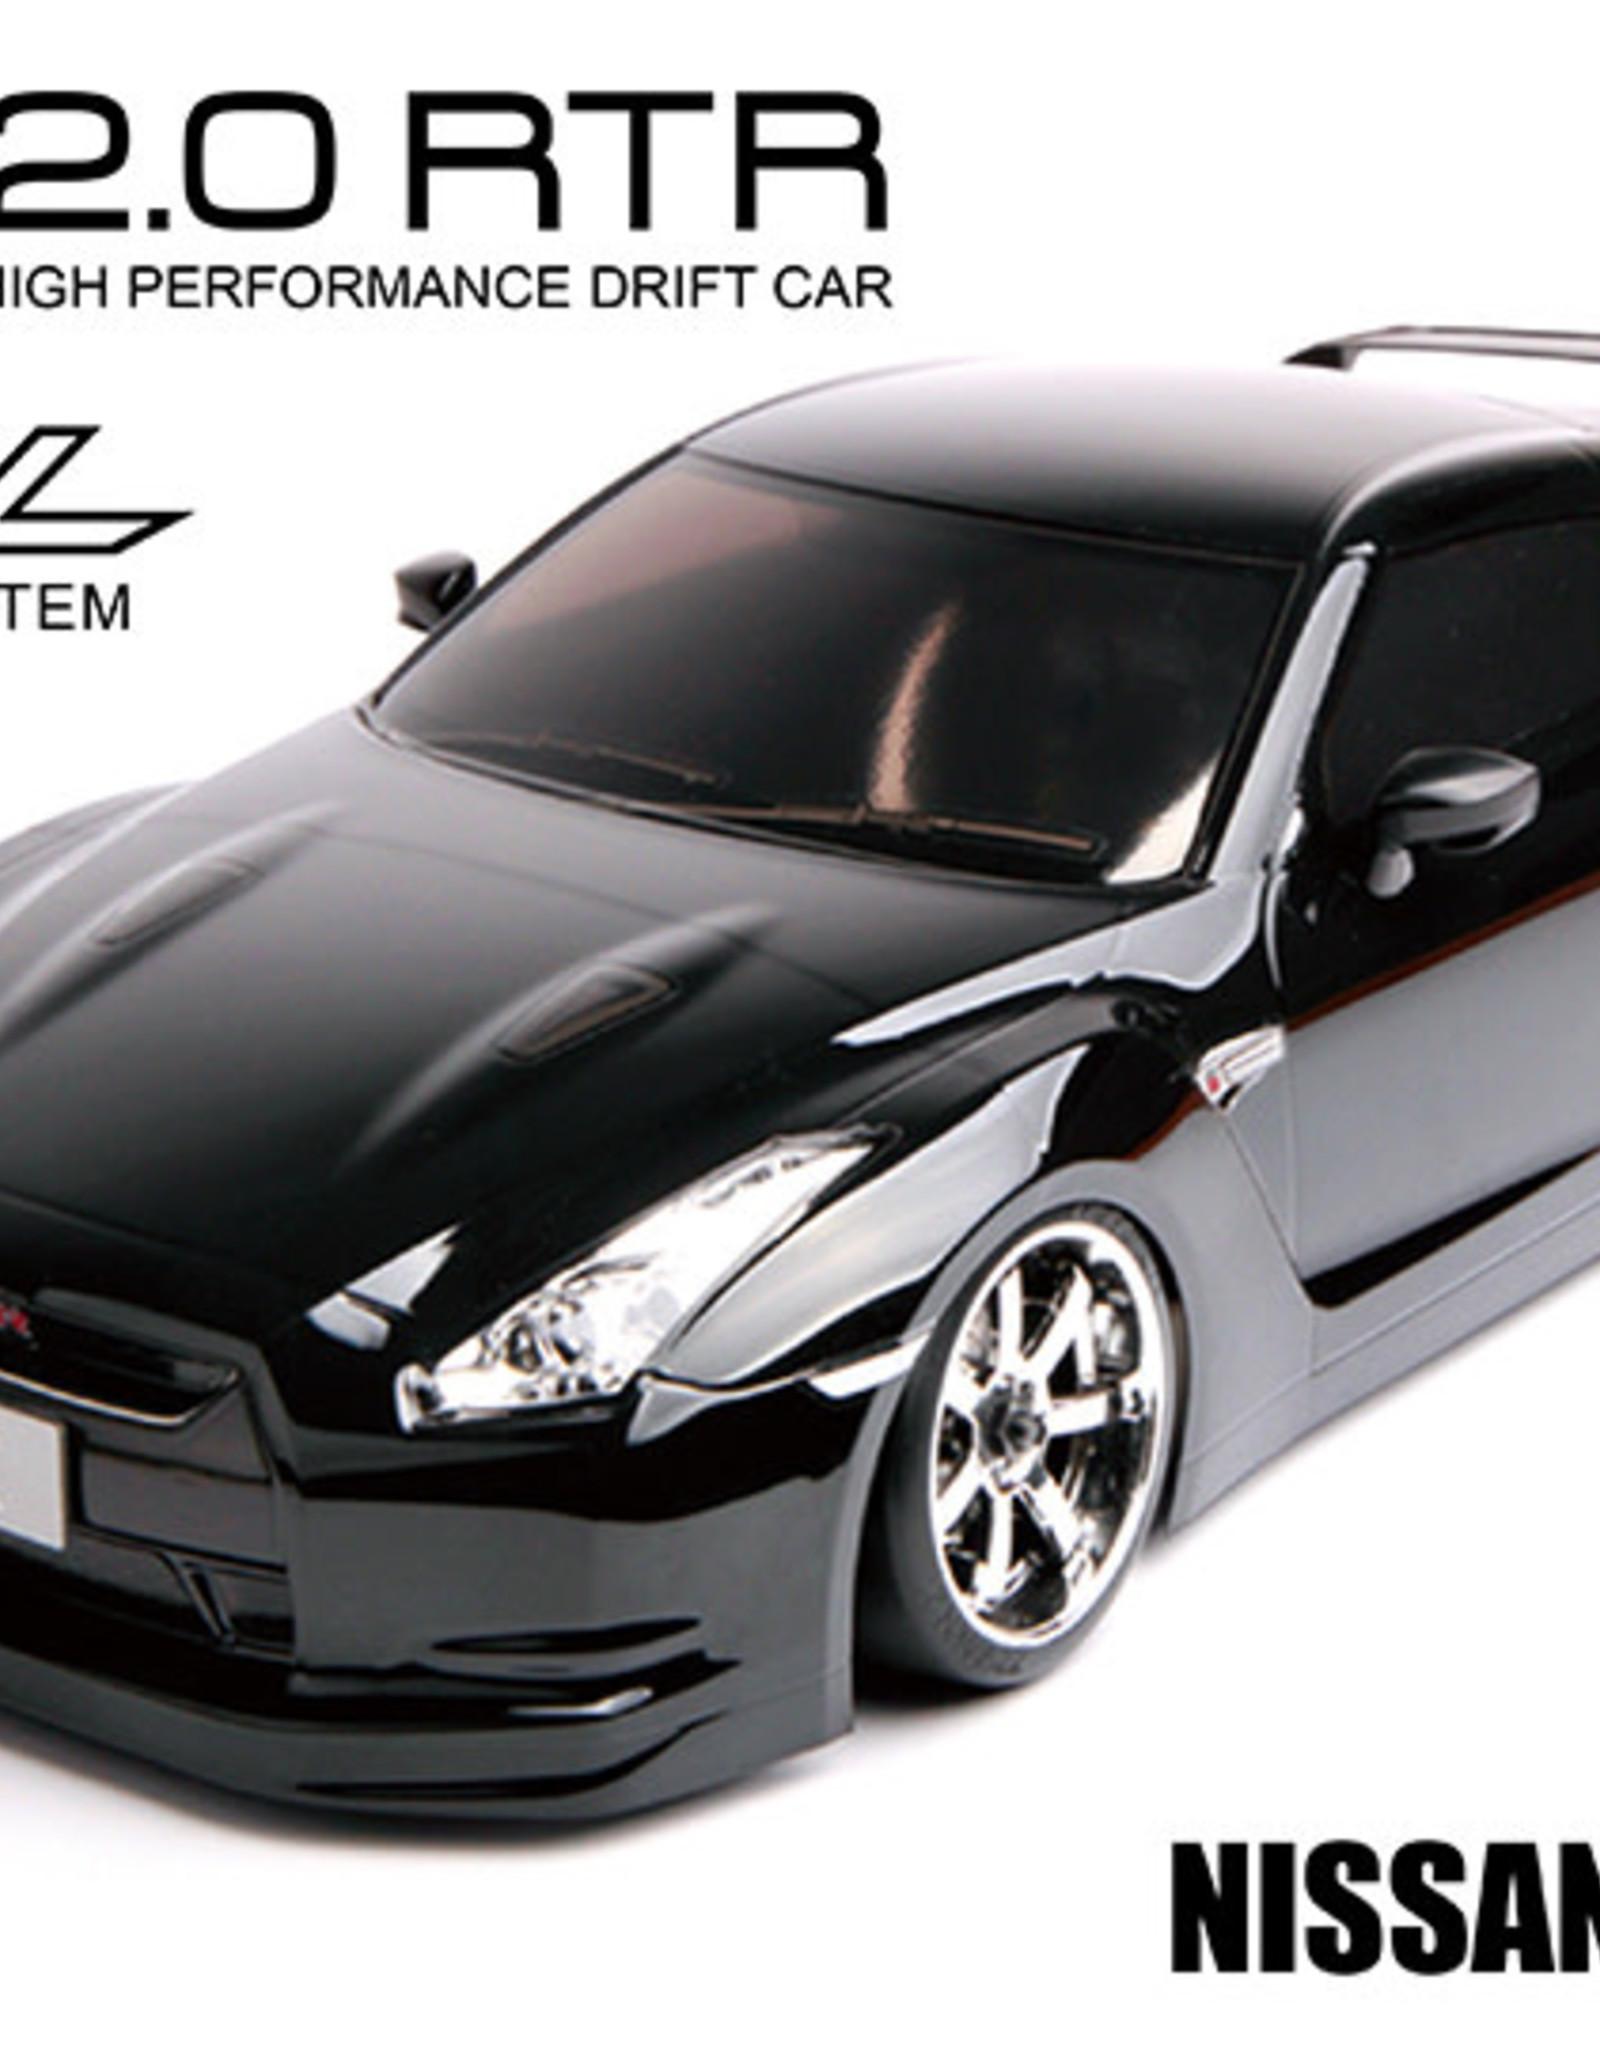 MST 533702 RMX 2.0 RTR Nissan R35 GT-R (black) (brushless) 533702 by MST